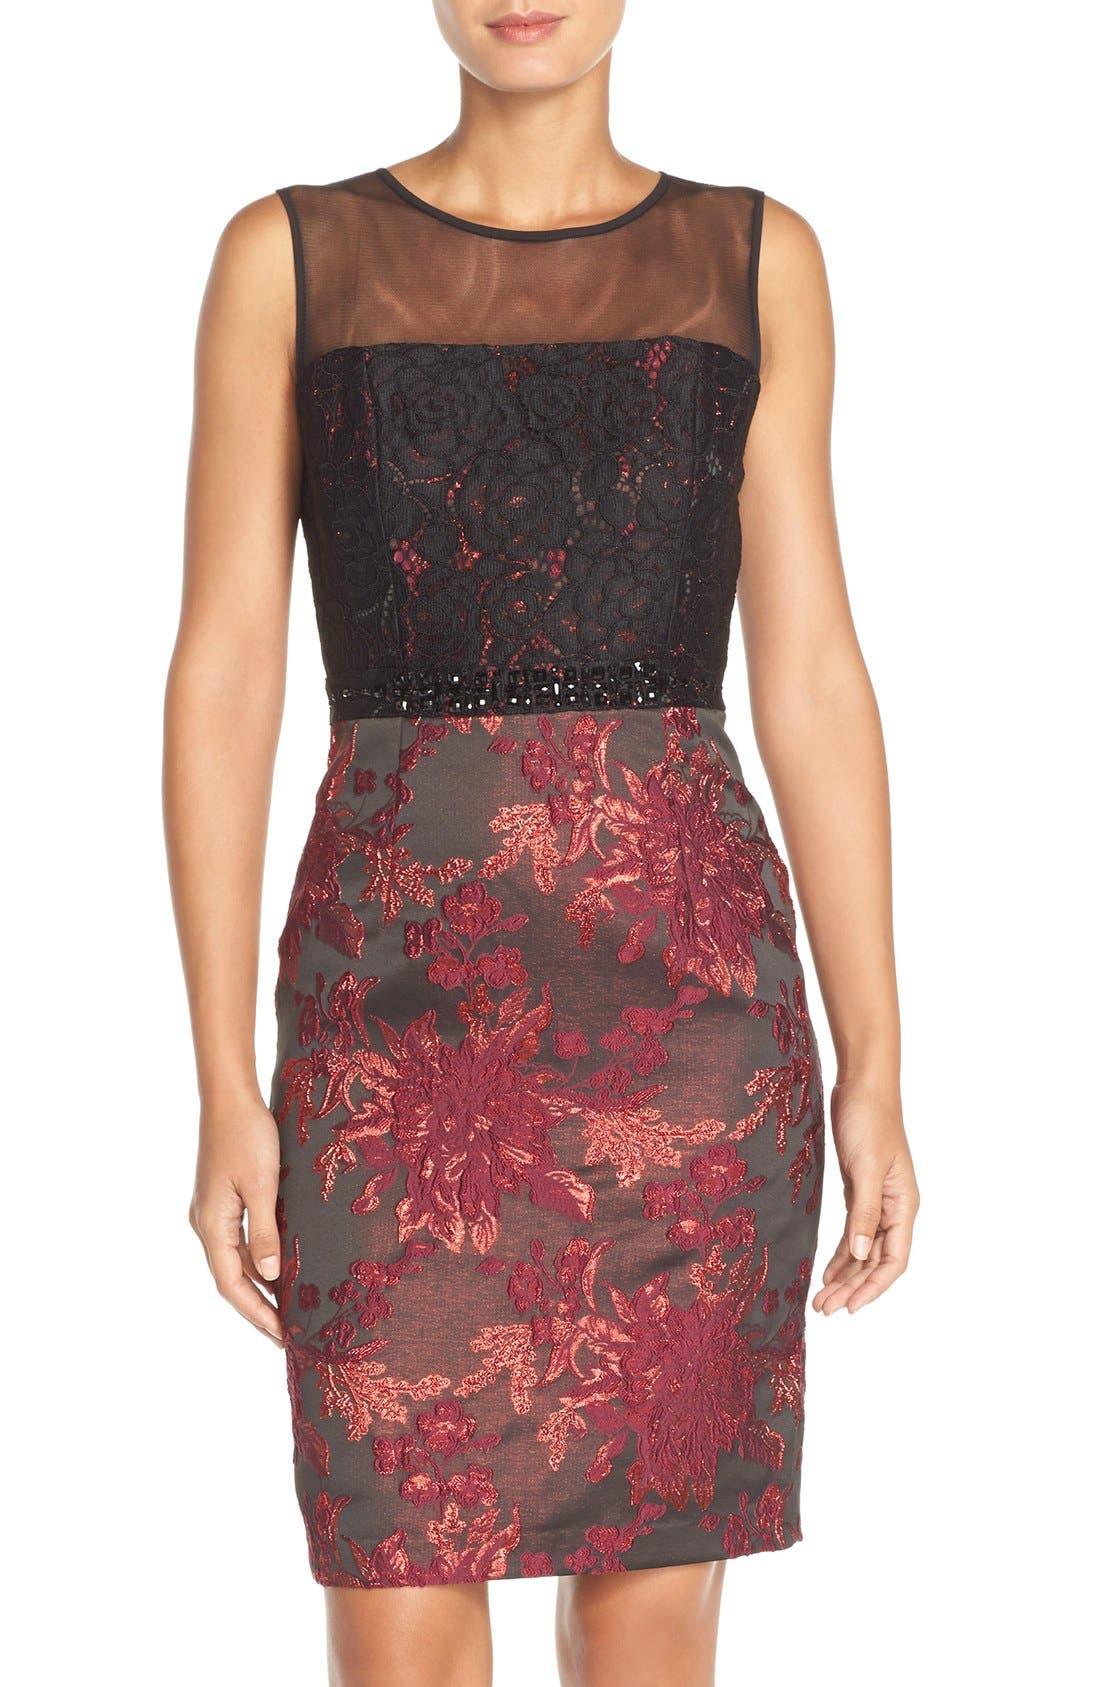 Alternate Image 1 Selected - Adrianna Papell Embellished Lace & Jacquard Sheath Dress